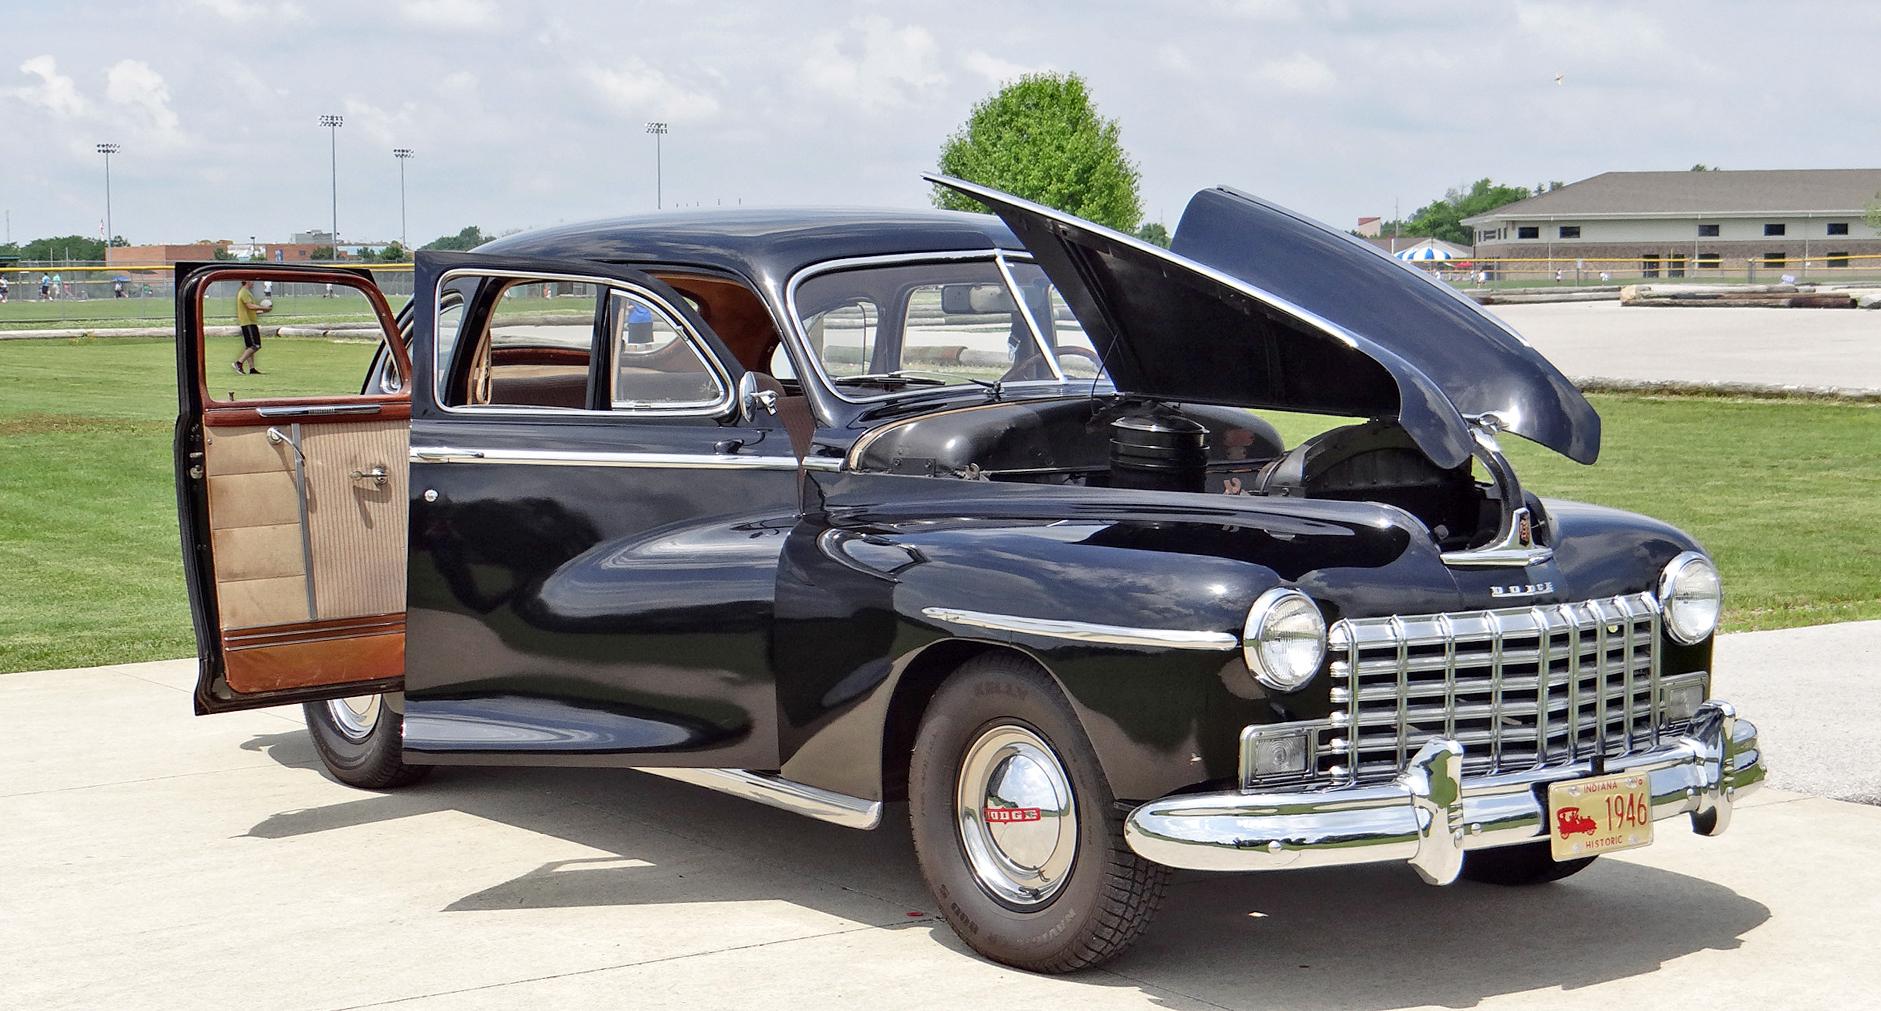 File1946 Dodge D24C 4-Door Sedan Suicide Doors u0026 Gullwing Hood 262. & File:1946 Dodge D24C 4-Door Sedan Suicide Doors u0026 Gullwing Hood 262 ...